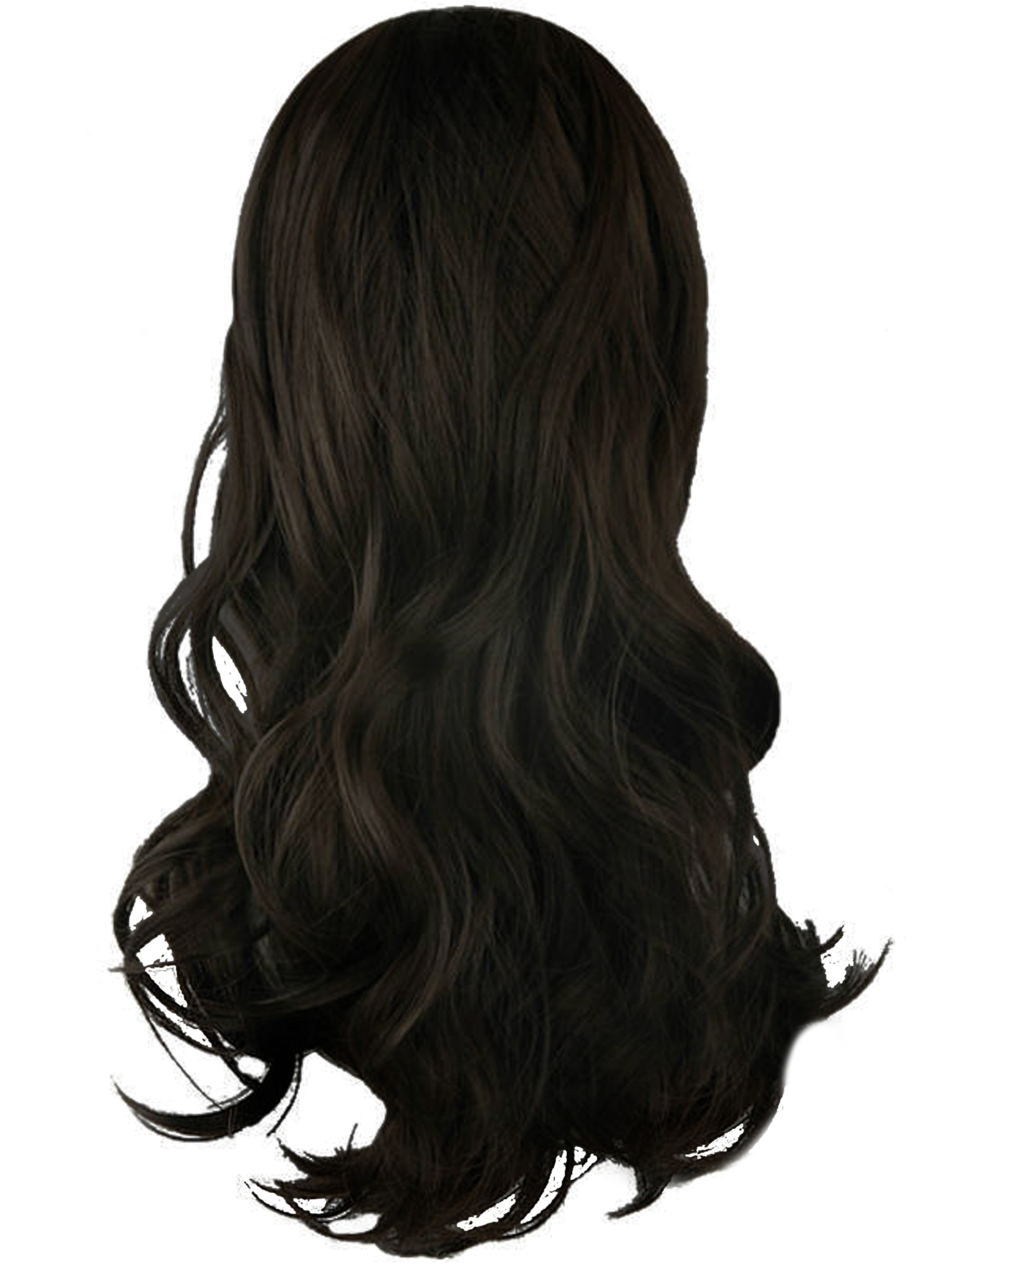 Hair PNG - 23562